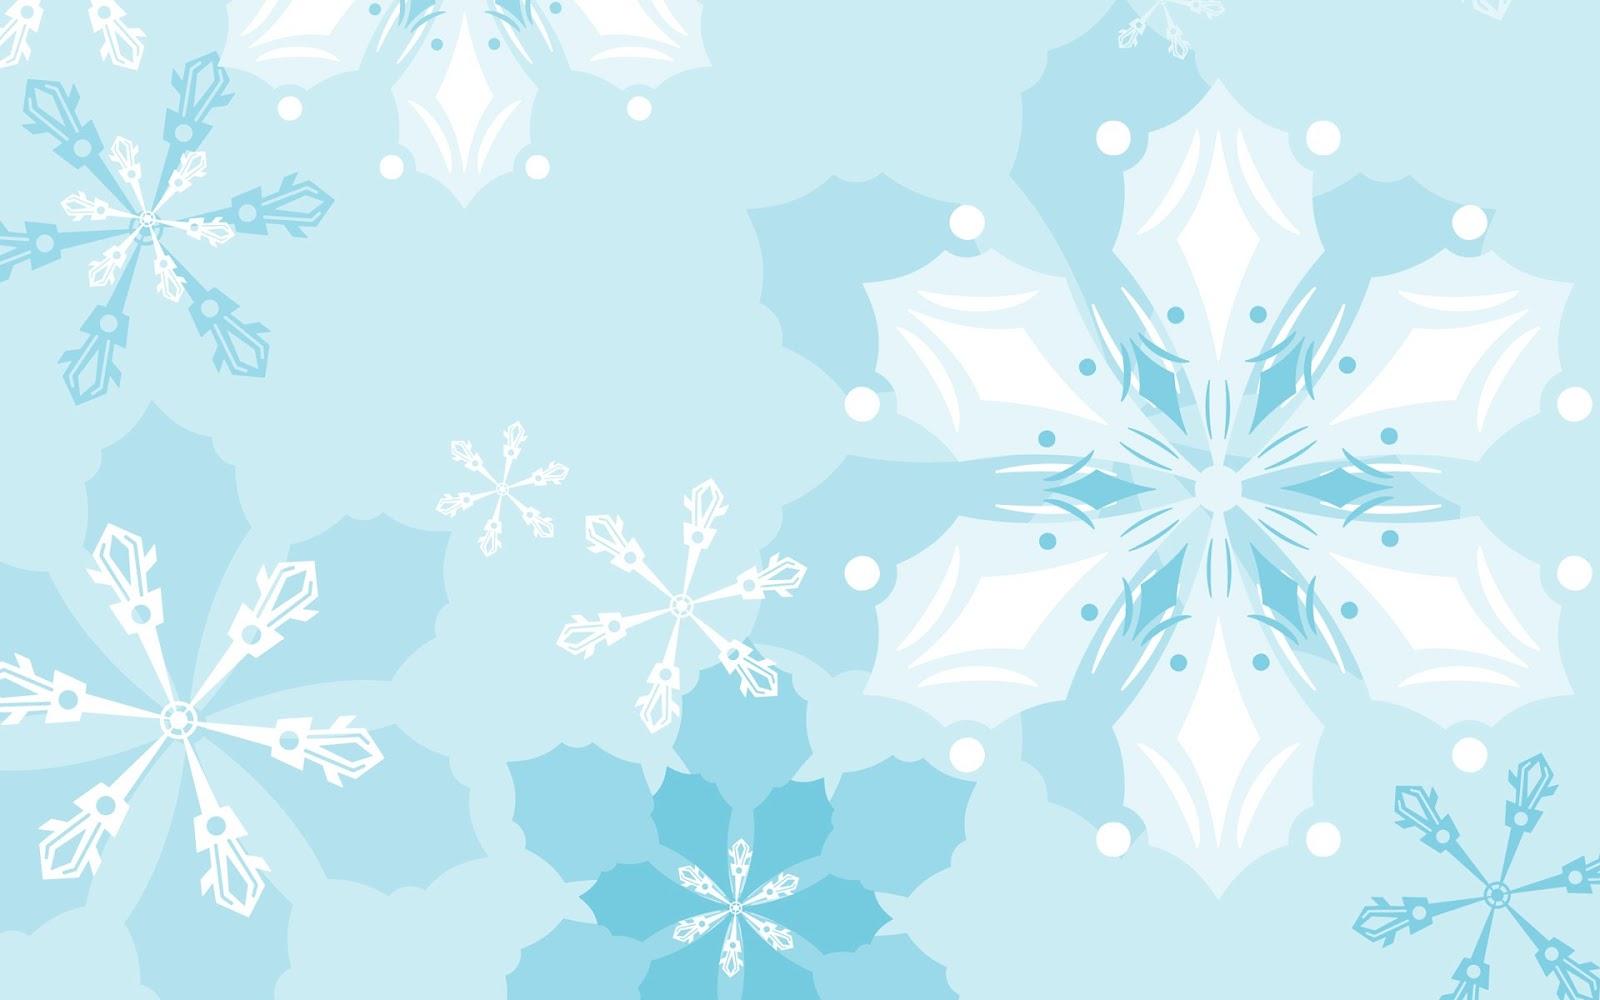 Nabilas Diary Blog Background Winter and Snow 1600x1000